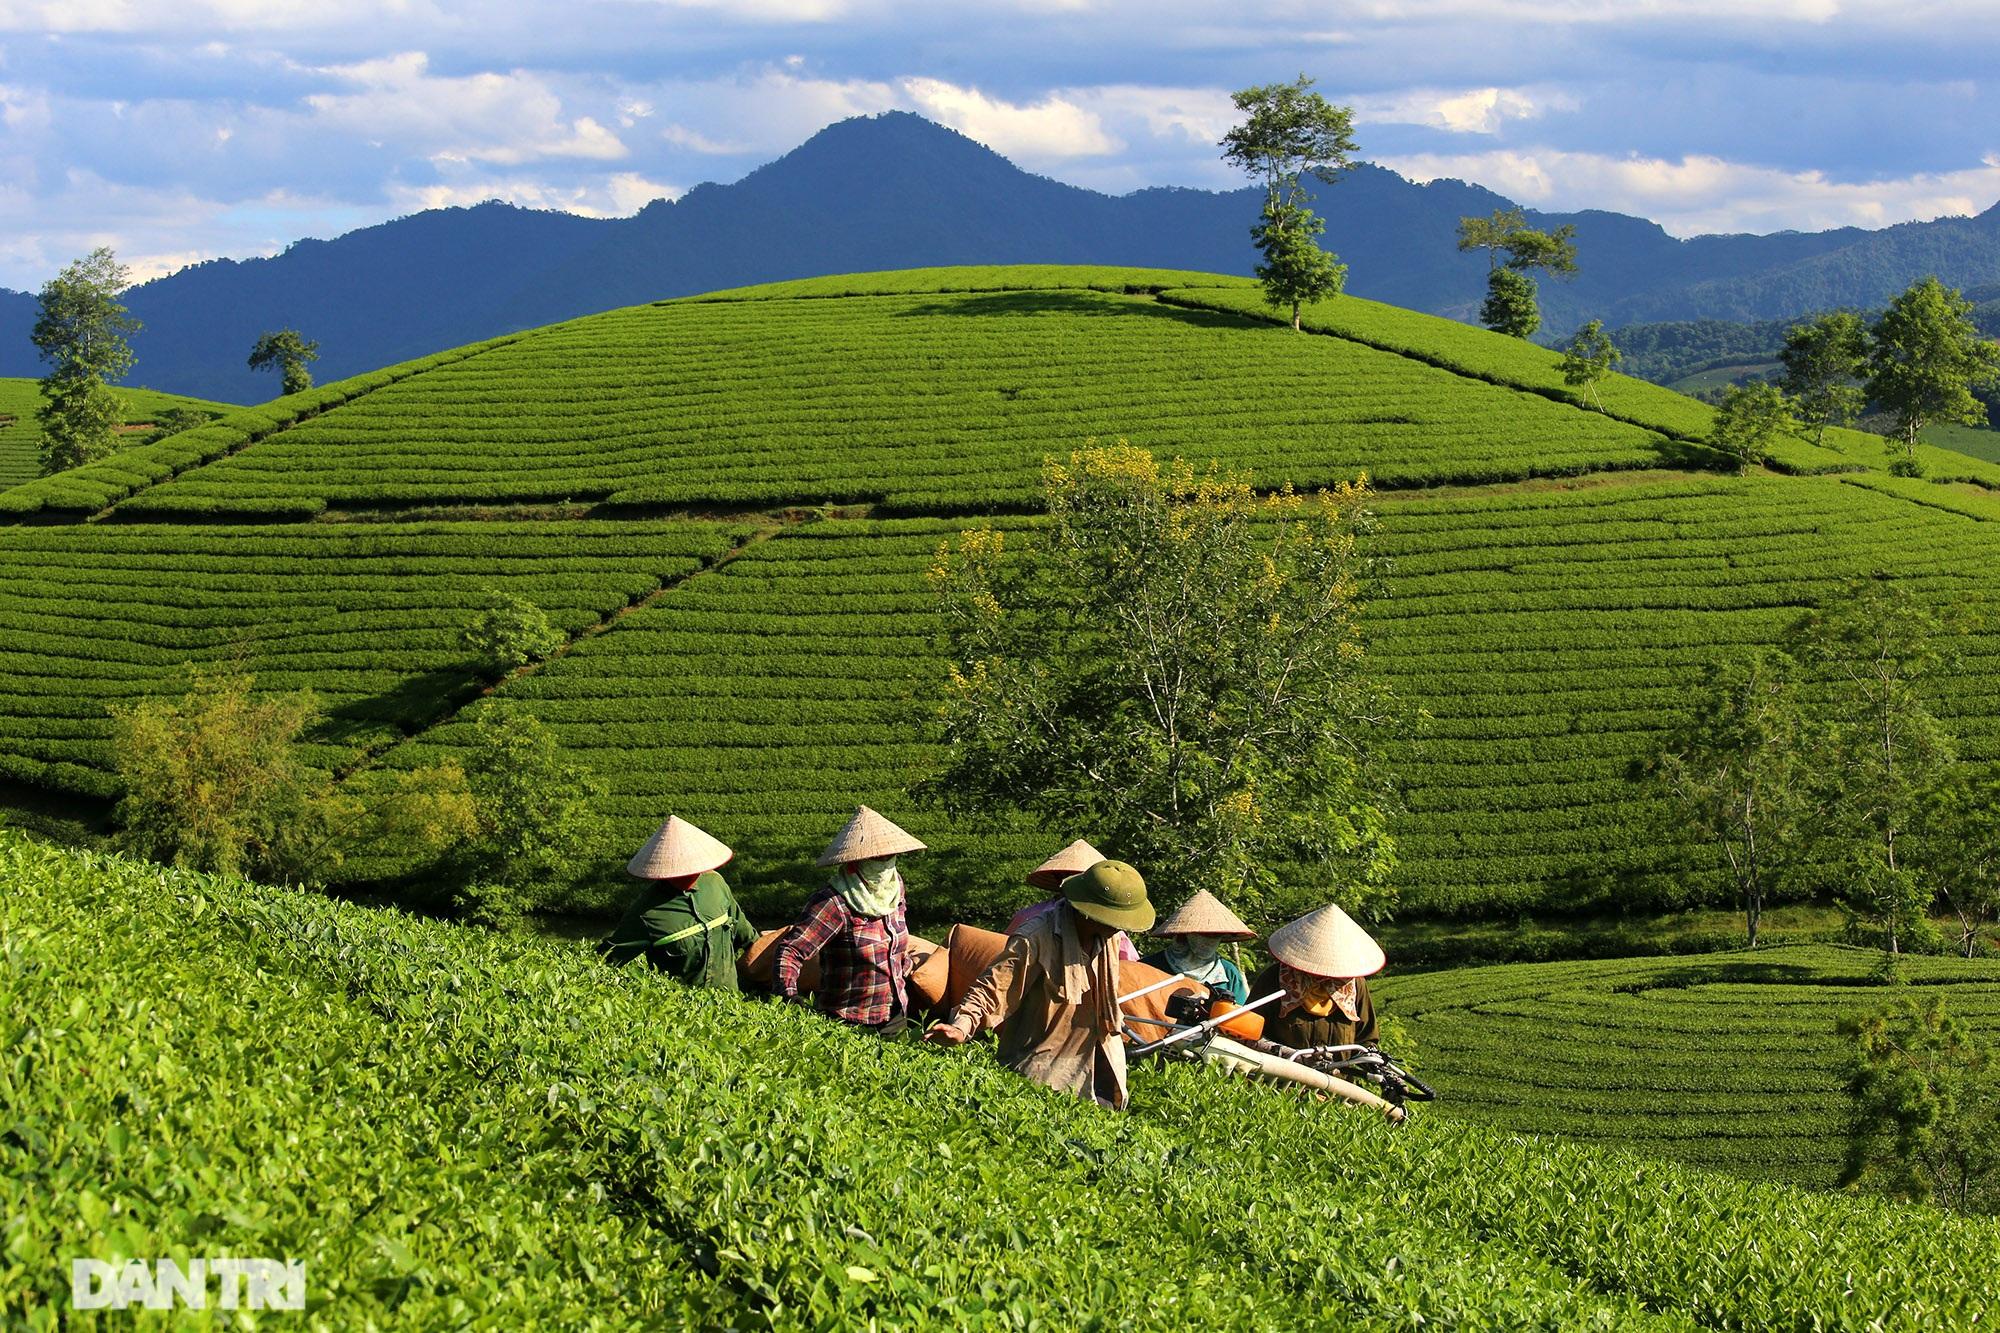 Overwhelming scenery of Long Coc tea hills in Phu Tho - 2